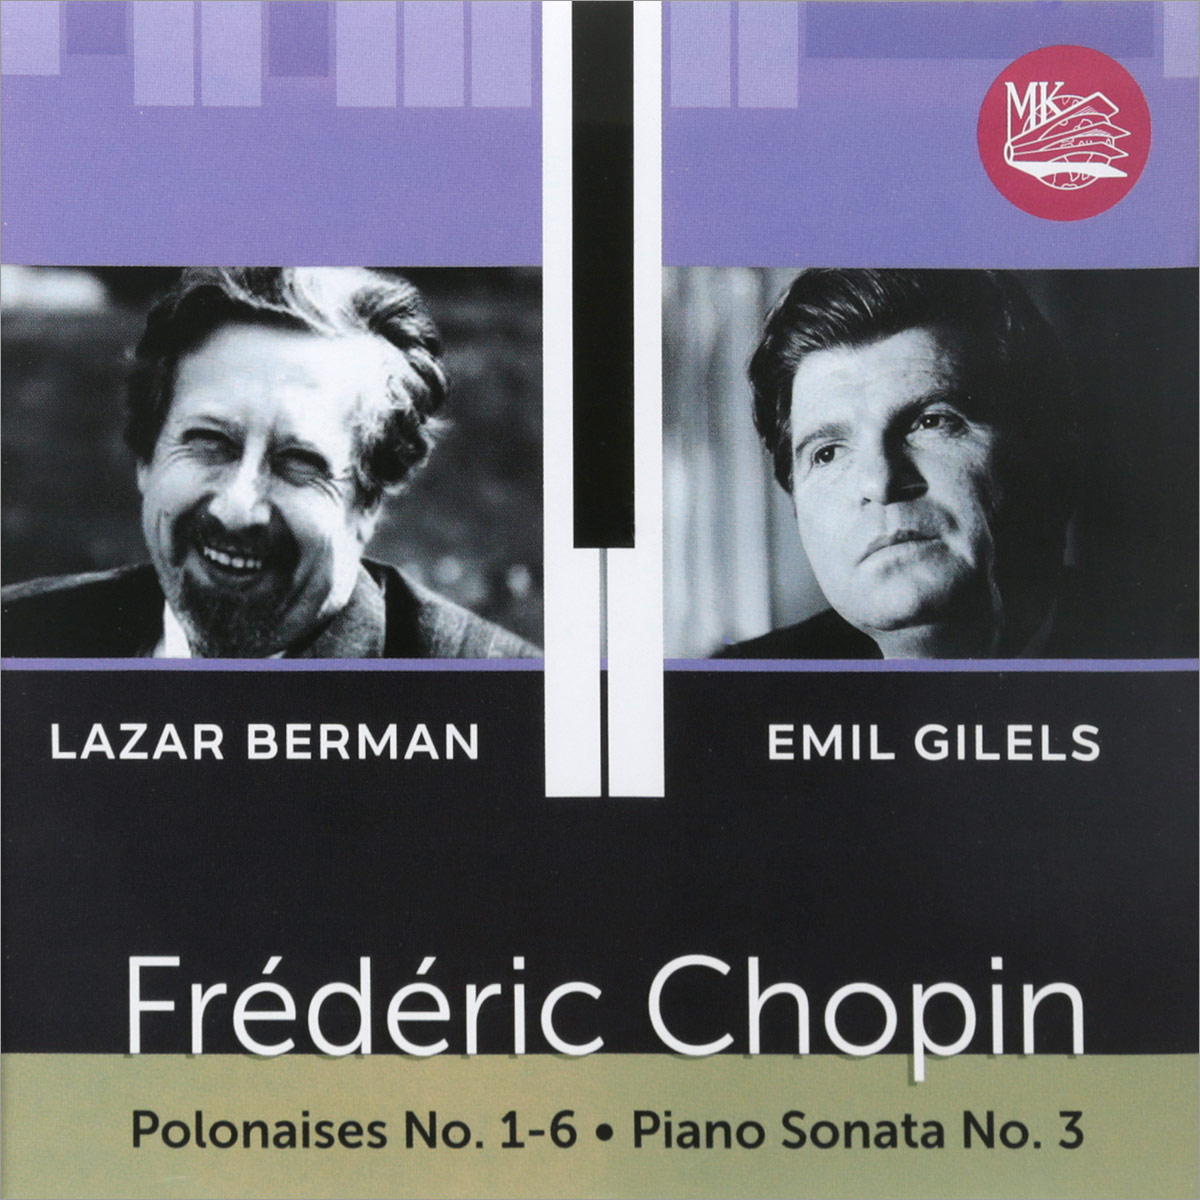 Лазарь Берман,Эмиль Гилельс Lazar Berman, Emil Gilels. Chopin. Polonaises No. 1-6 / Piano Sonata No. 3 эмиль гилельс